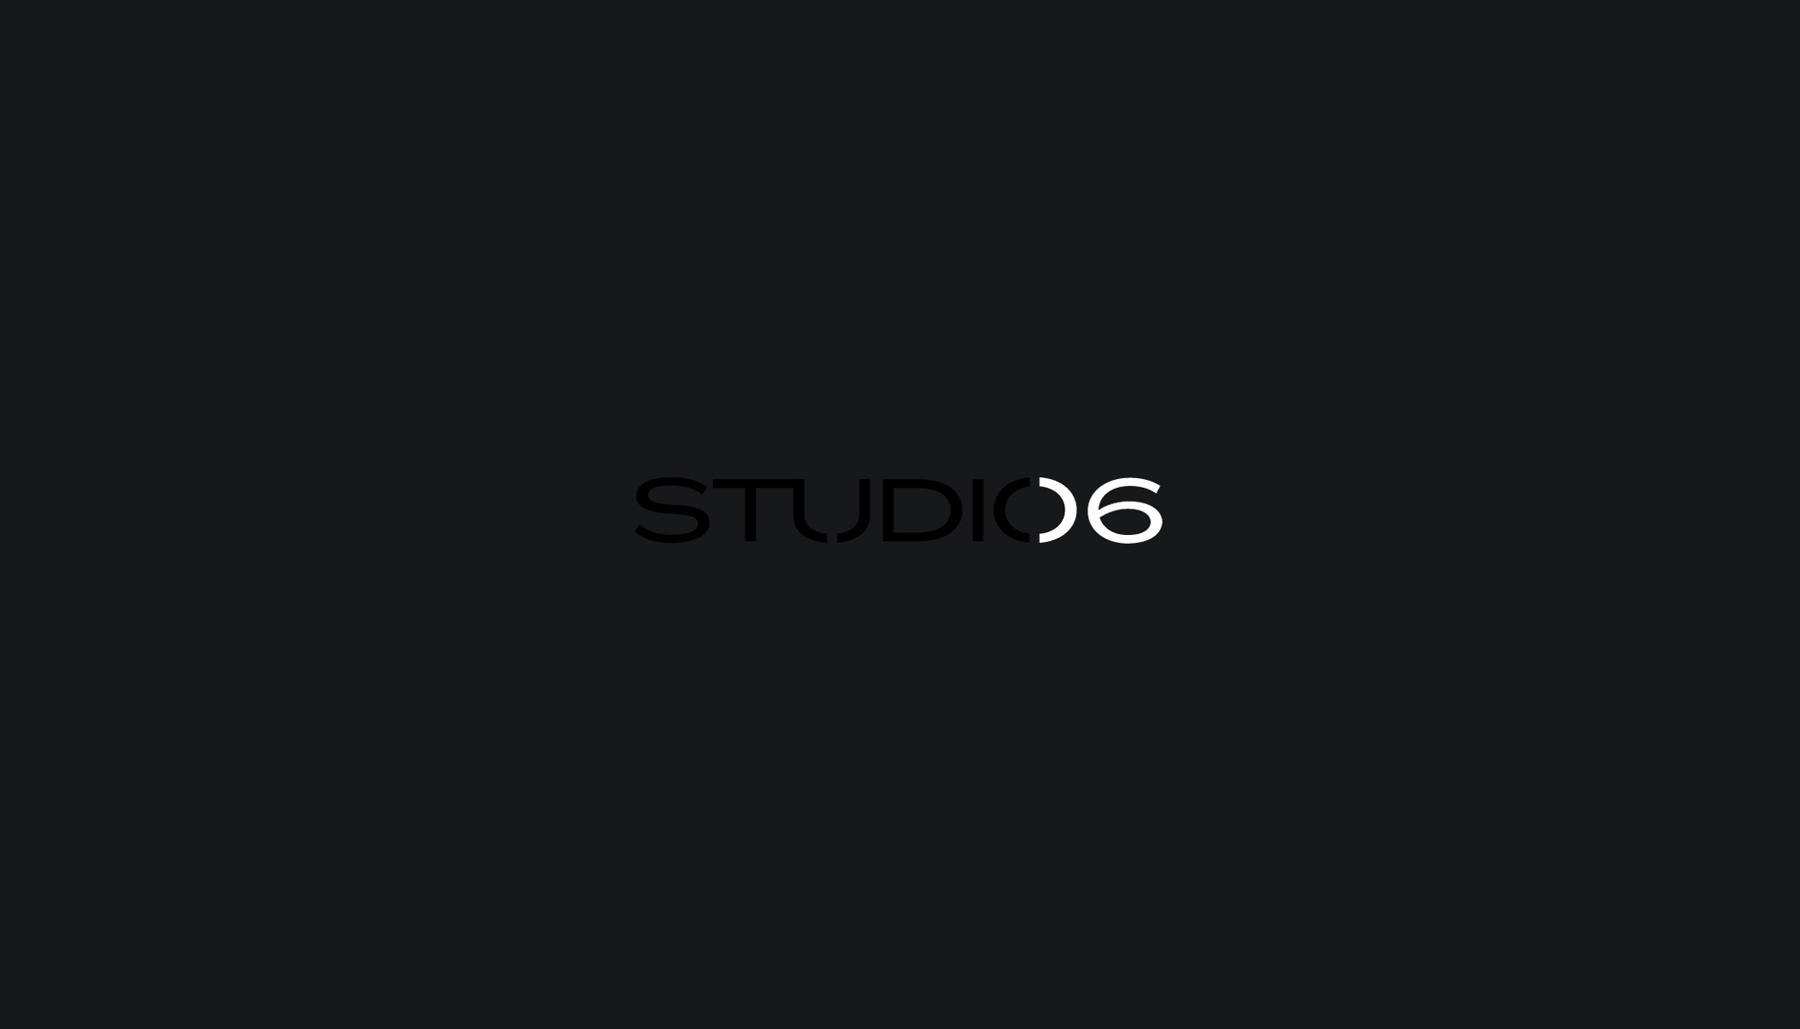 Studio 06 Architectural firm brand, branding architecture firm identity, AEC branding, Richmond architecture firm